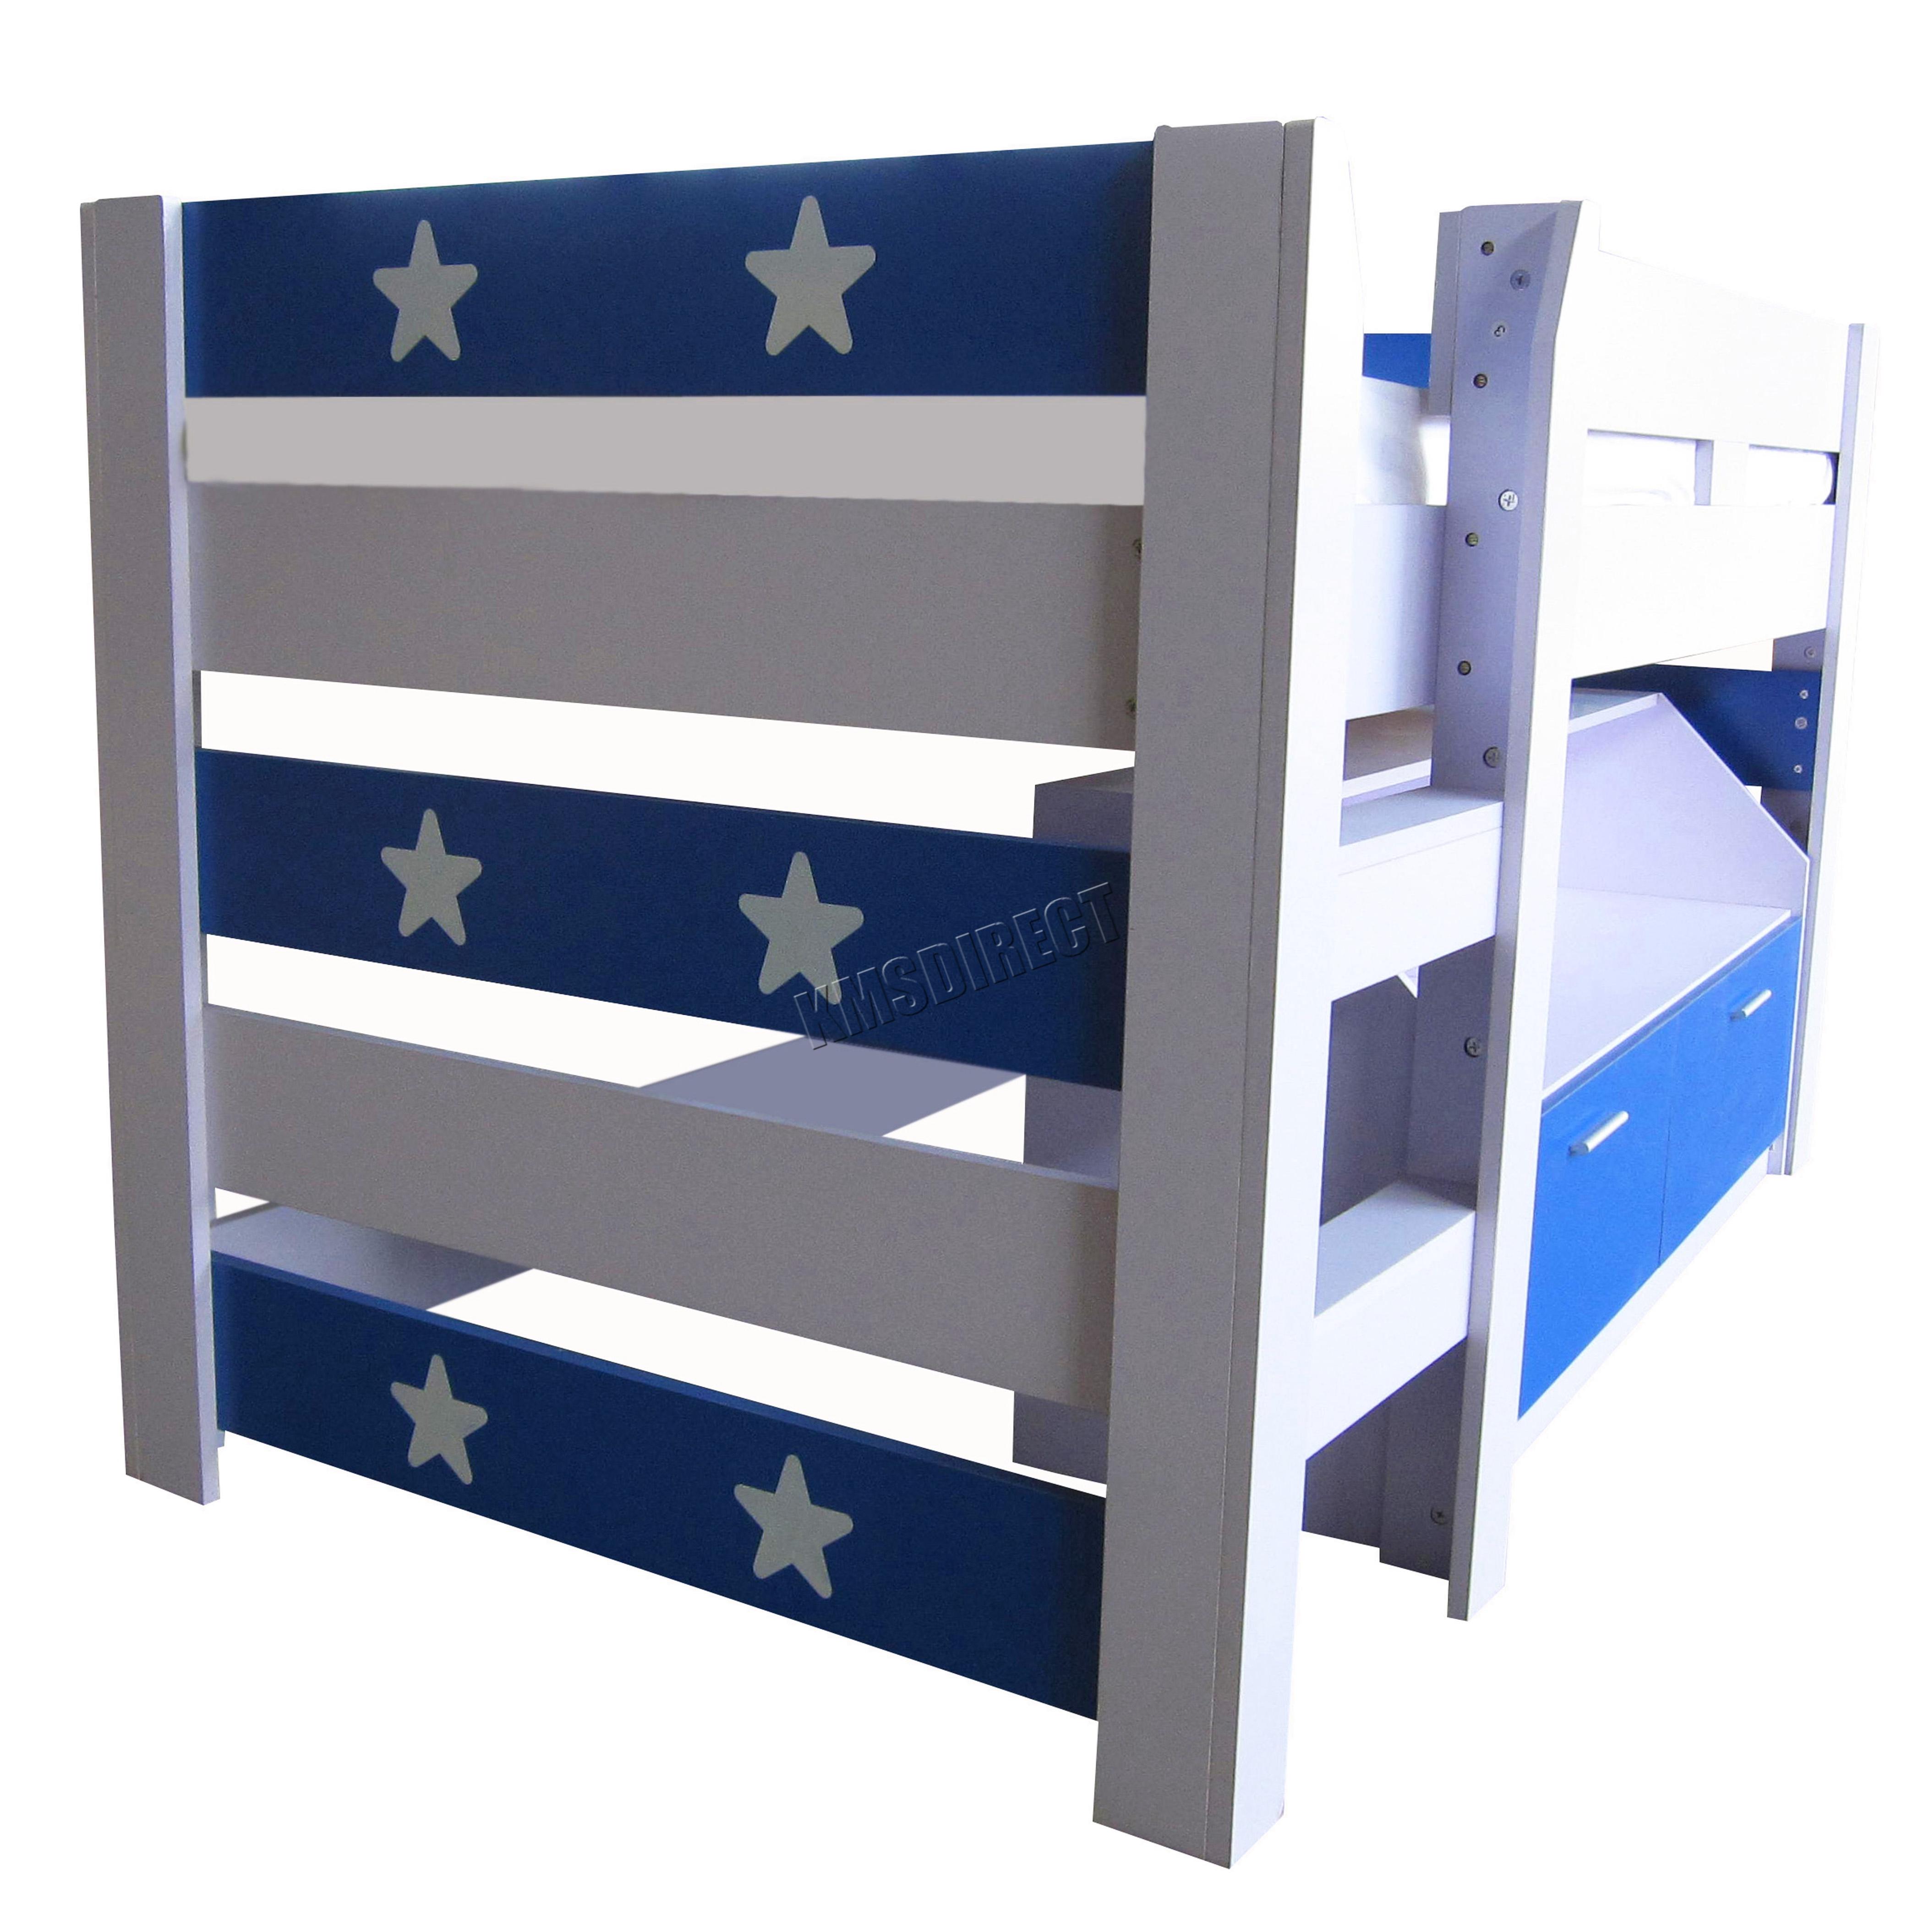 foxhunter mdf kids 3ft mid sleeper cabin bunk bed wooden with book shelf storage ebay. Black Bedroom Furniture Sets. Home Design Ideas